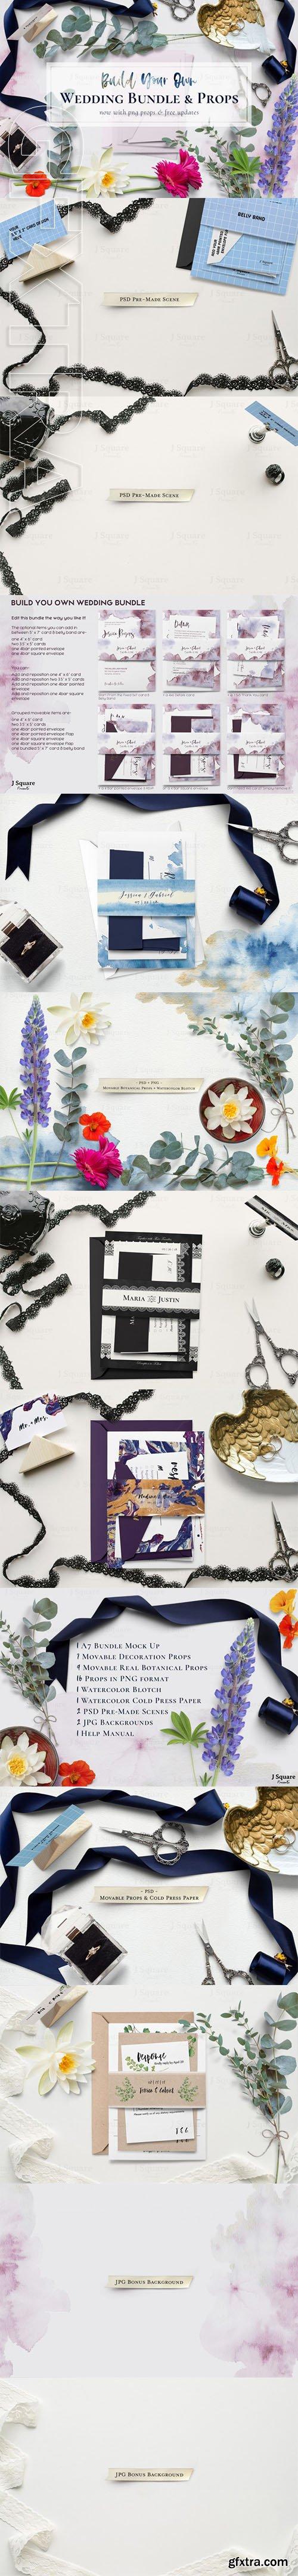 Build Your Own A7 Wedding Bundle Mock Up & Props